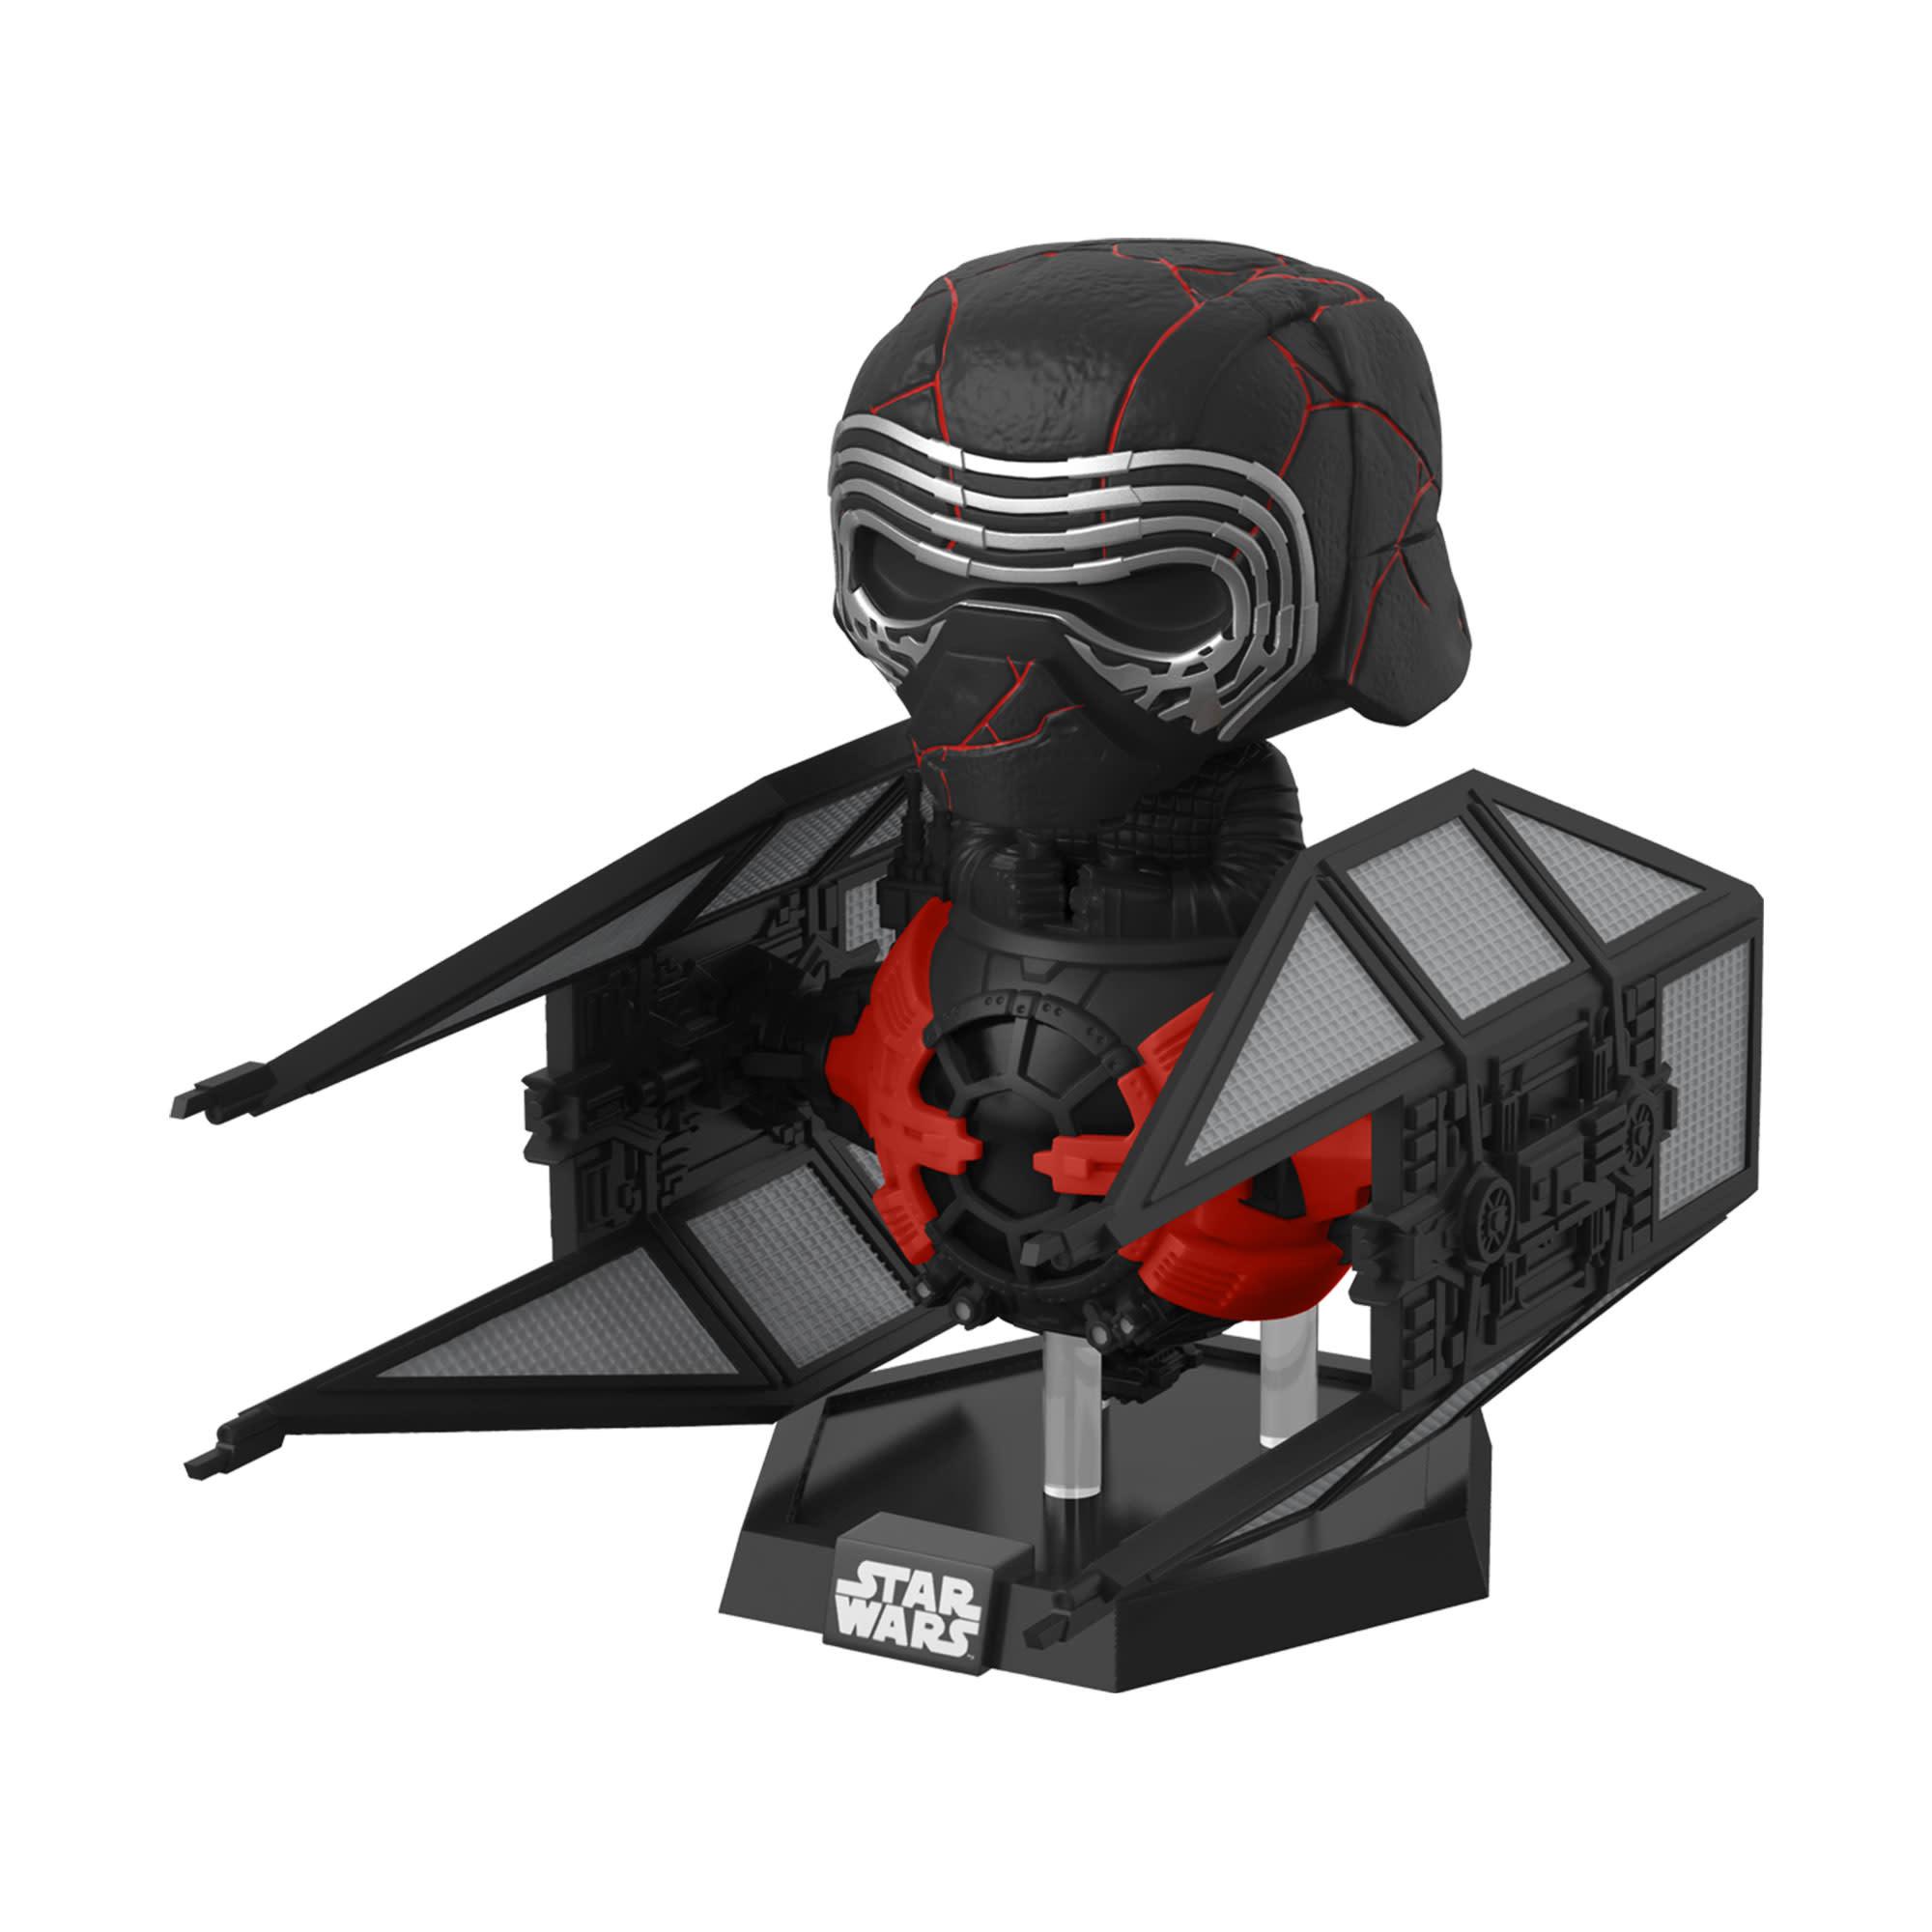 FUNKO Pop! Rides: Star Wars The Rise of Skywalker - Kylo Ren in TIE Whisper